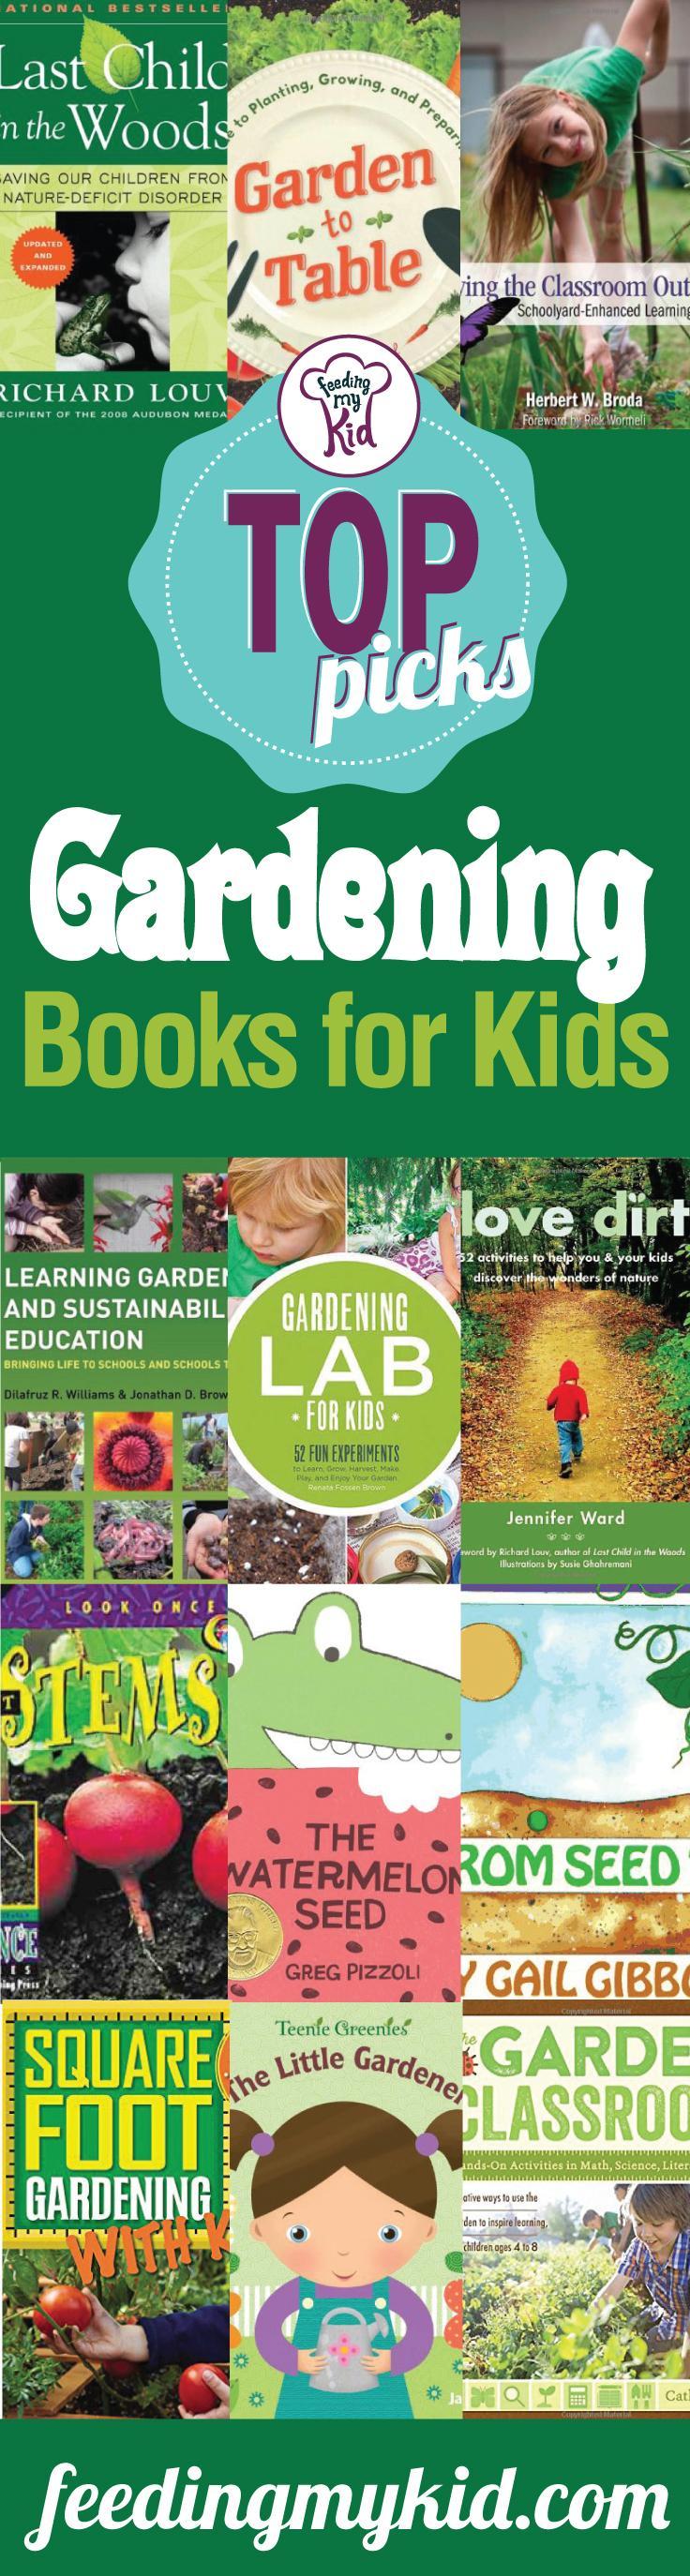 Gardening Books Our Top Picks Of Gardening Books For Kids